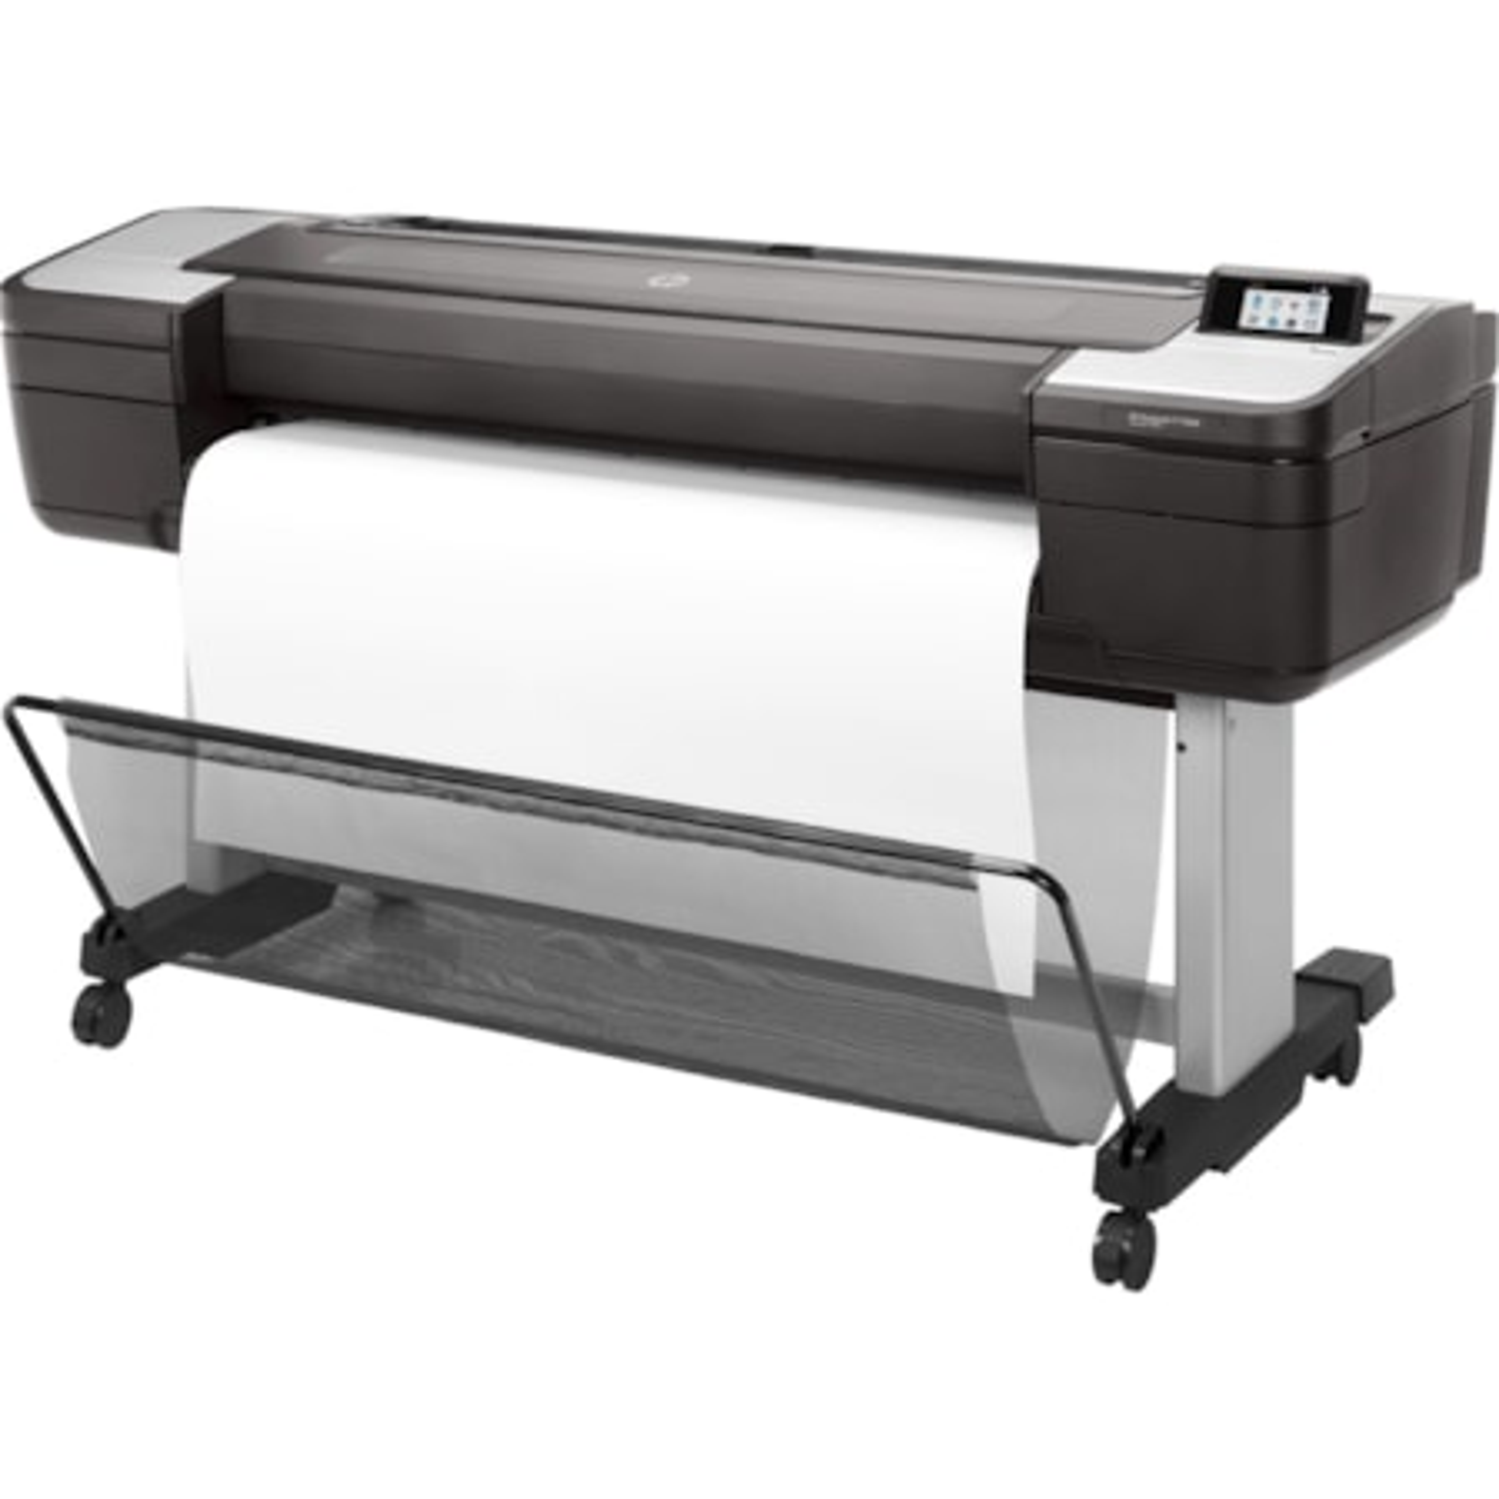 "HP Designjet T1700dr PostScript Inkjet Large Format Printer - 1117.60 mm (44"") Print Width - Colour"